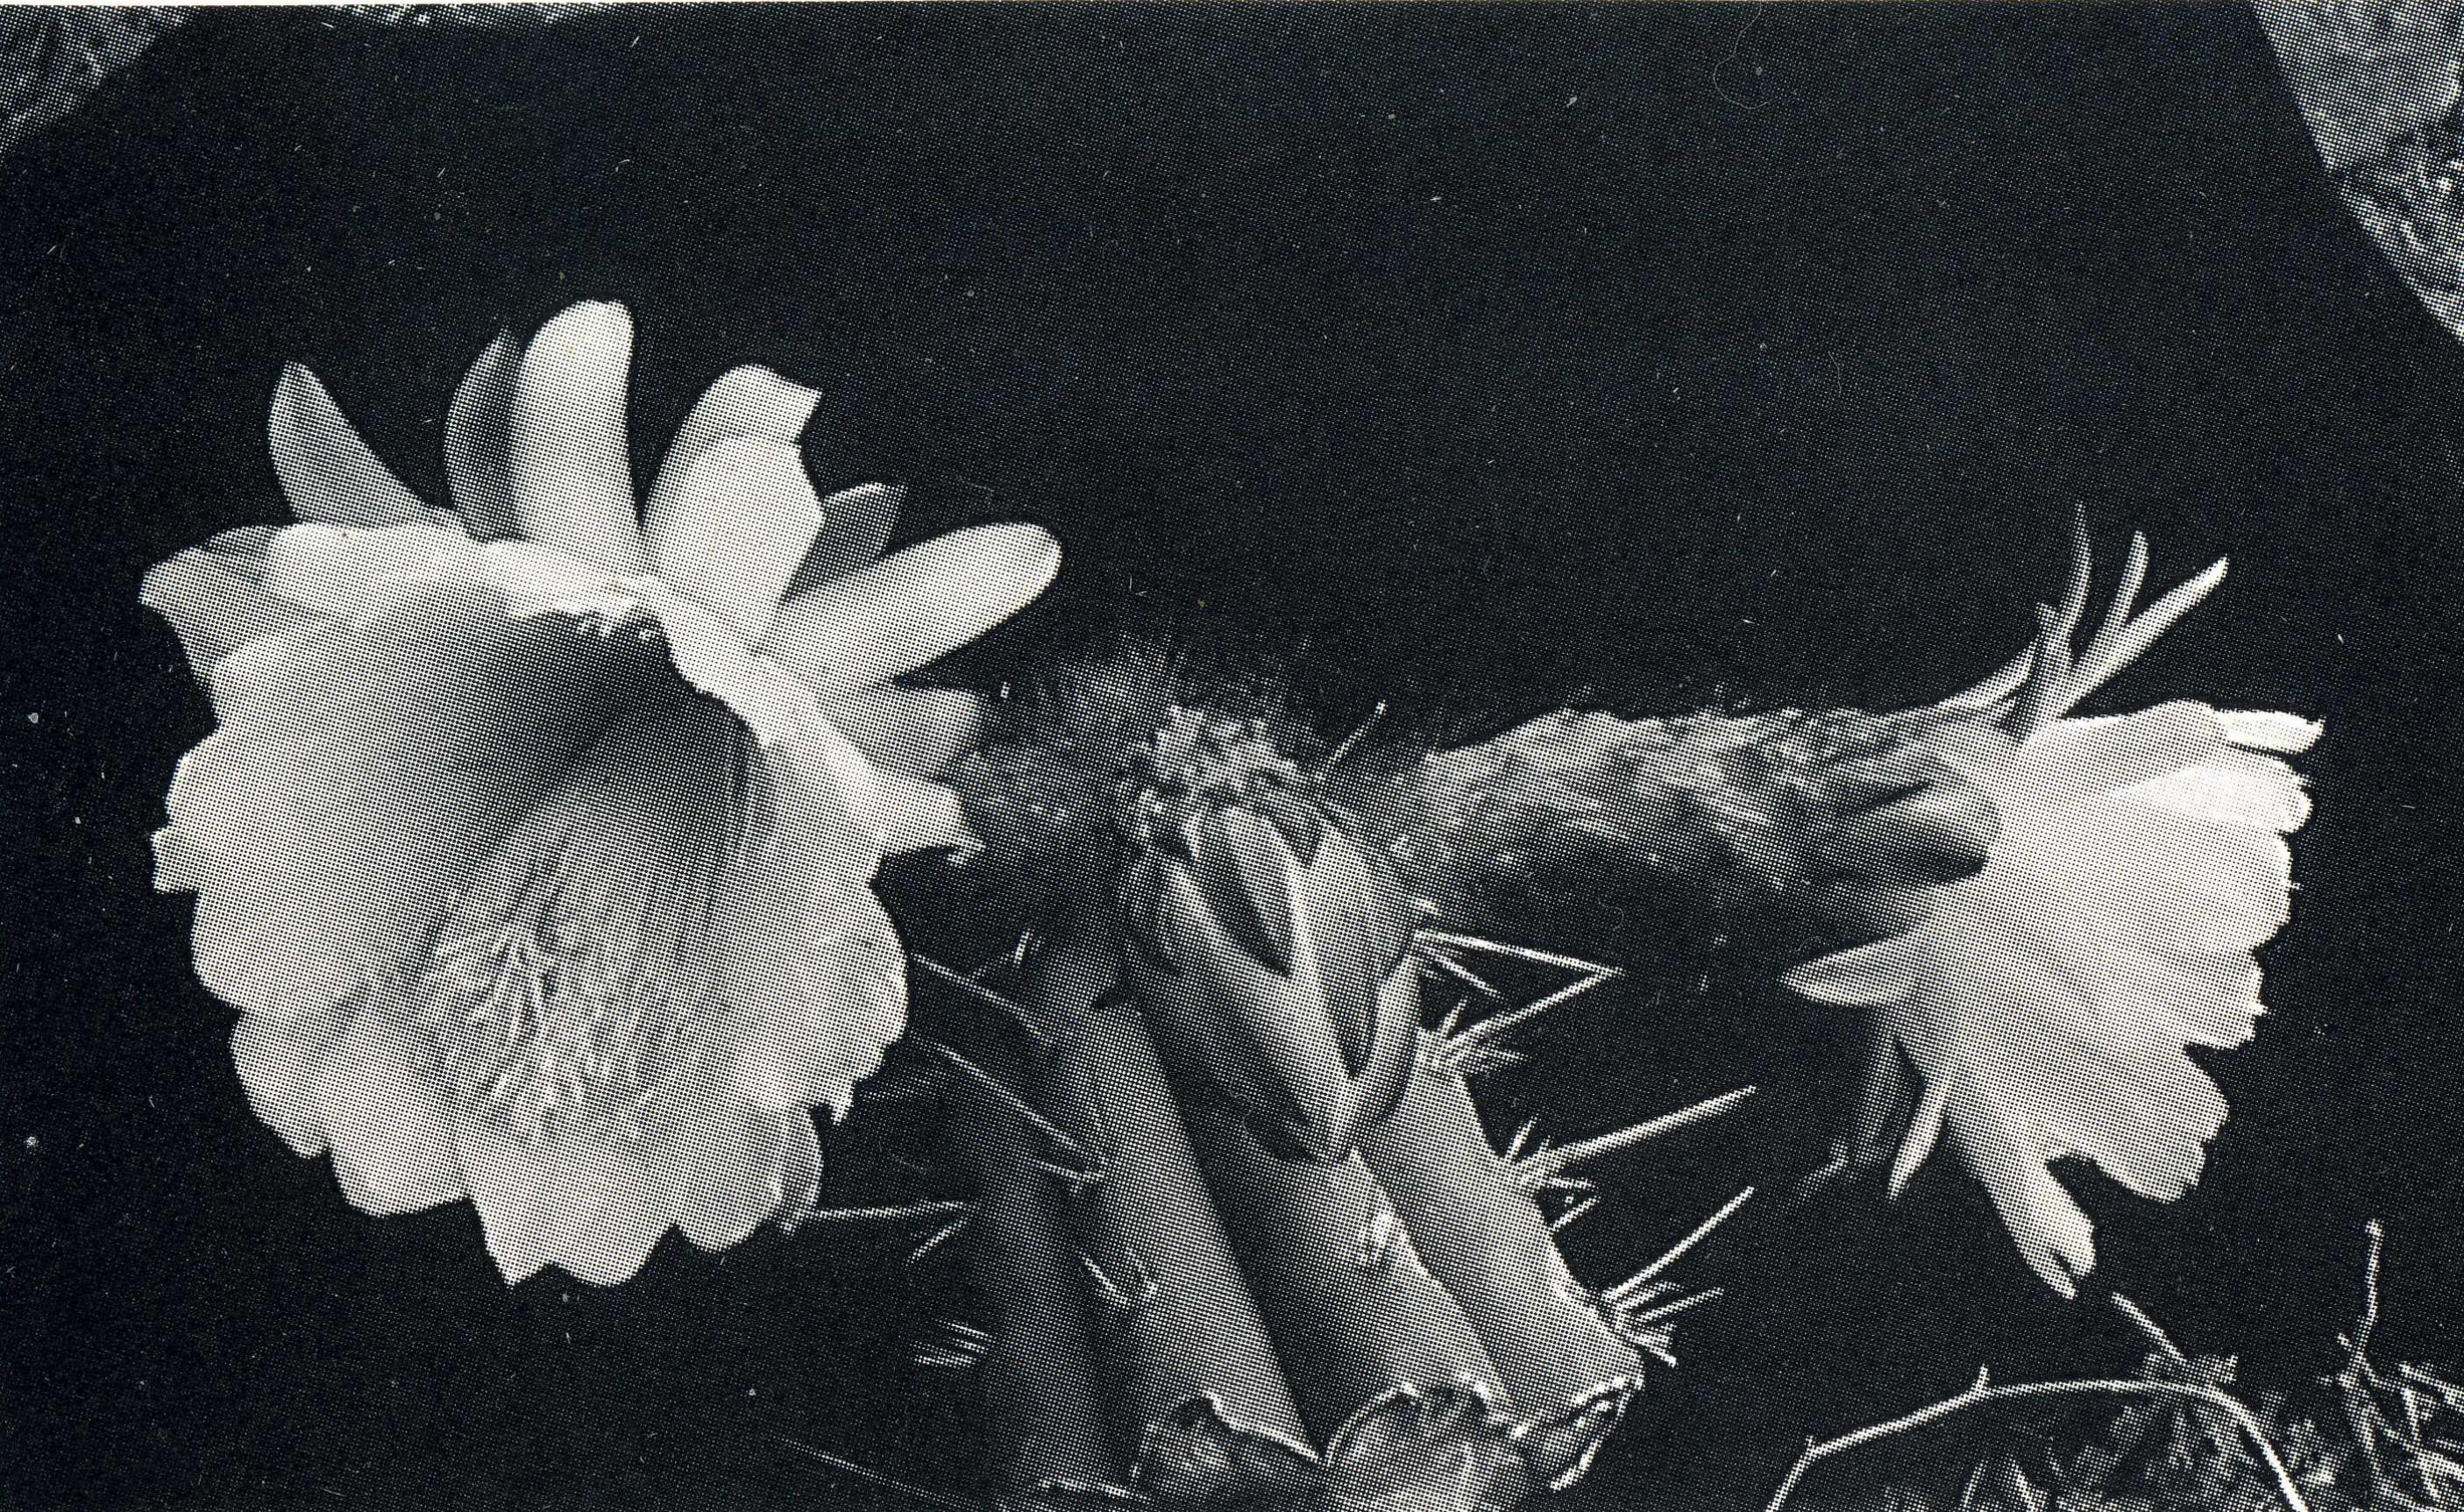 Trichocereus knuthianus Echinopsis knuthiana FR 677 Ritter